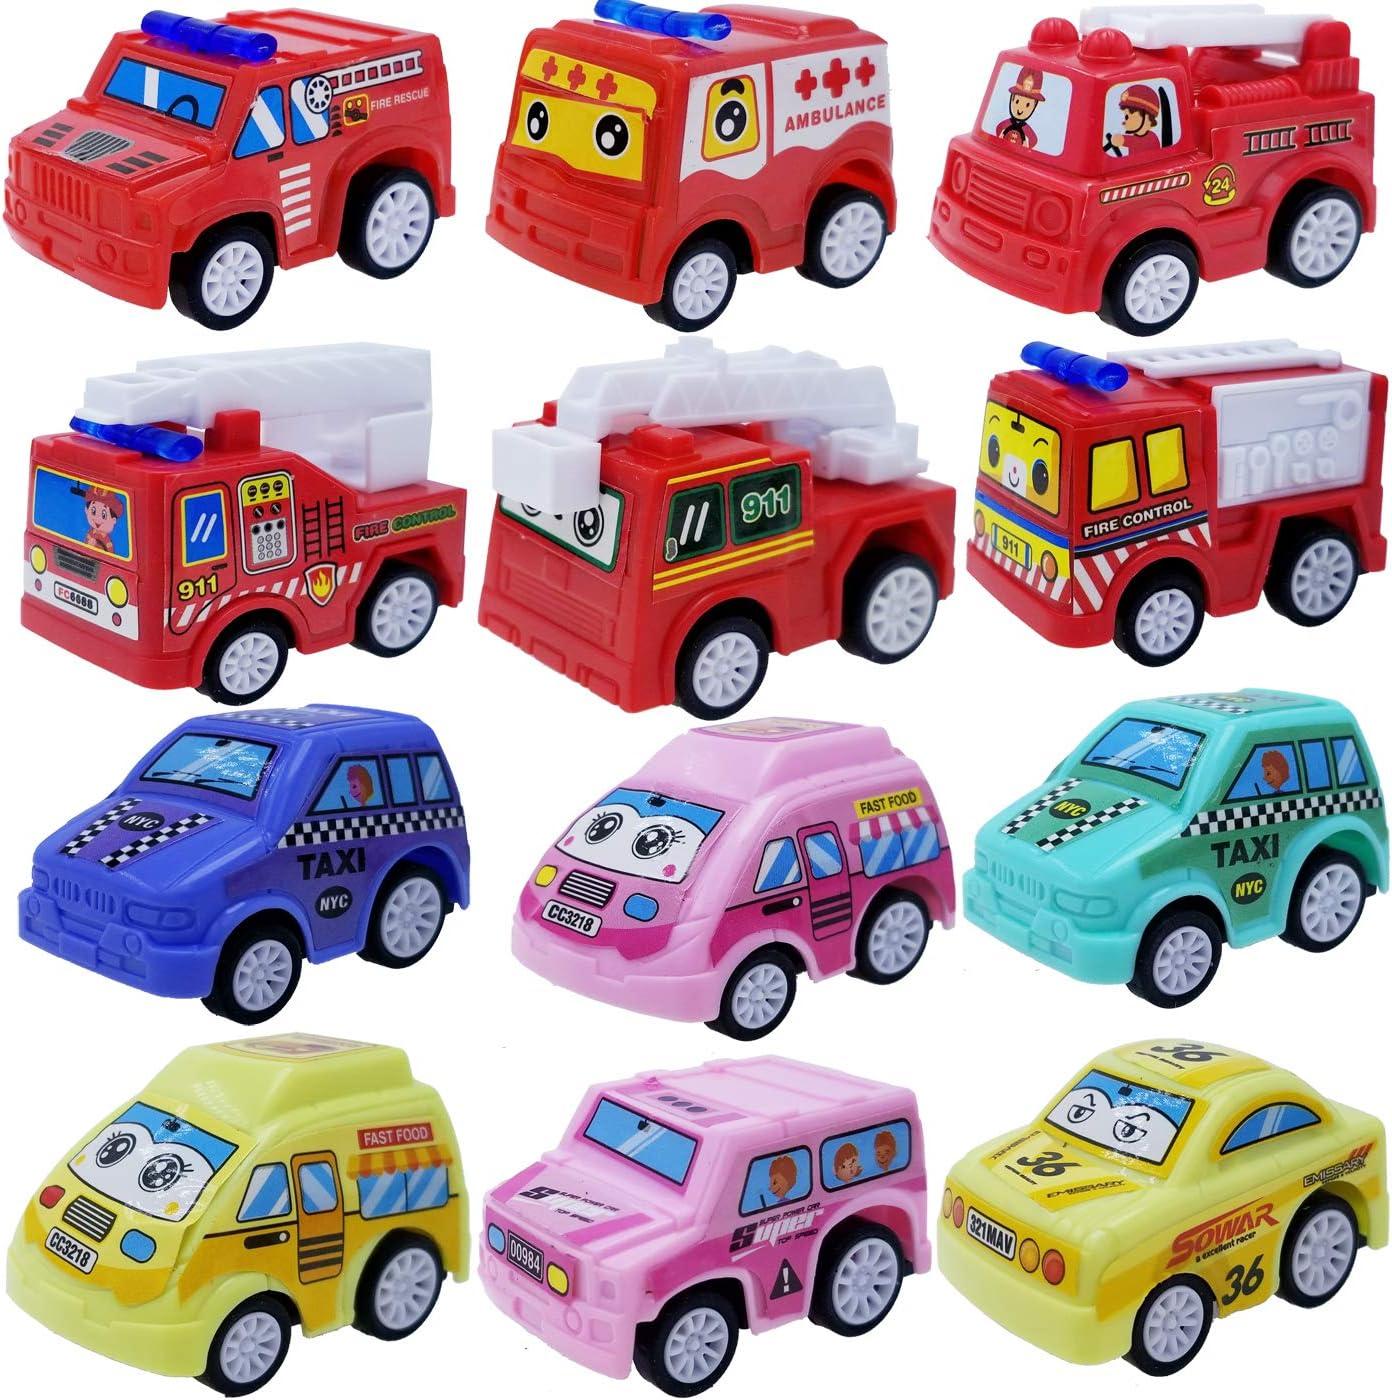 2Pcs Mini Ice Cream Car Model Plastic Pull Back Vehicle Kids Playing Truck Toys